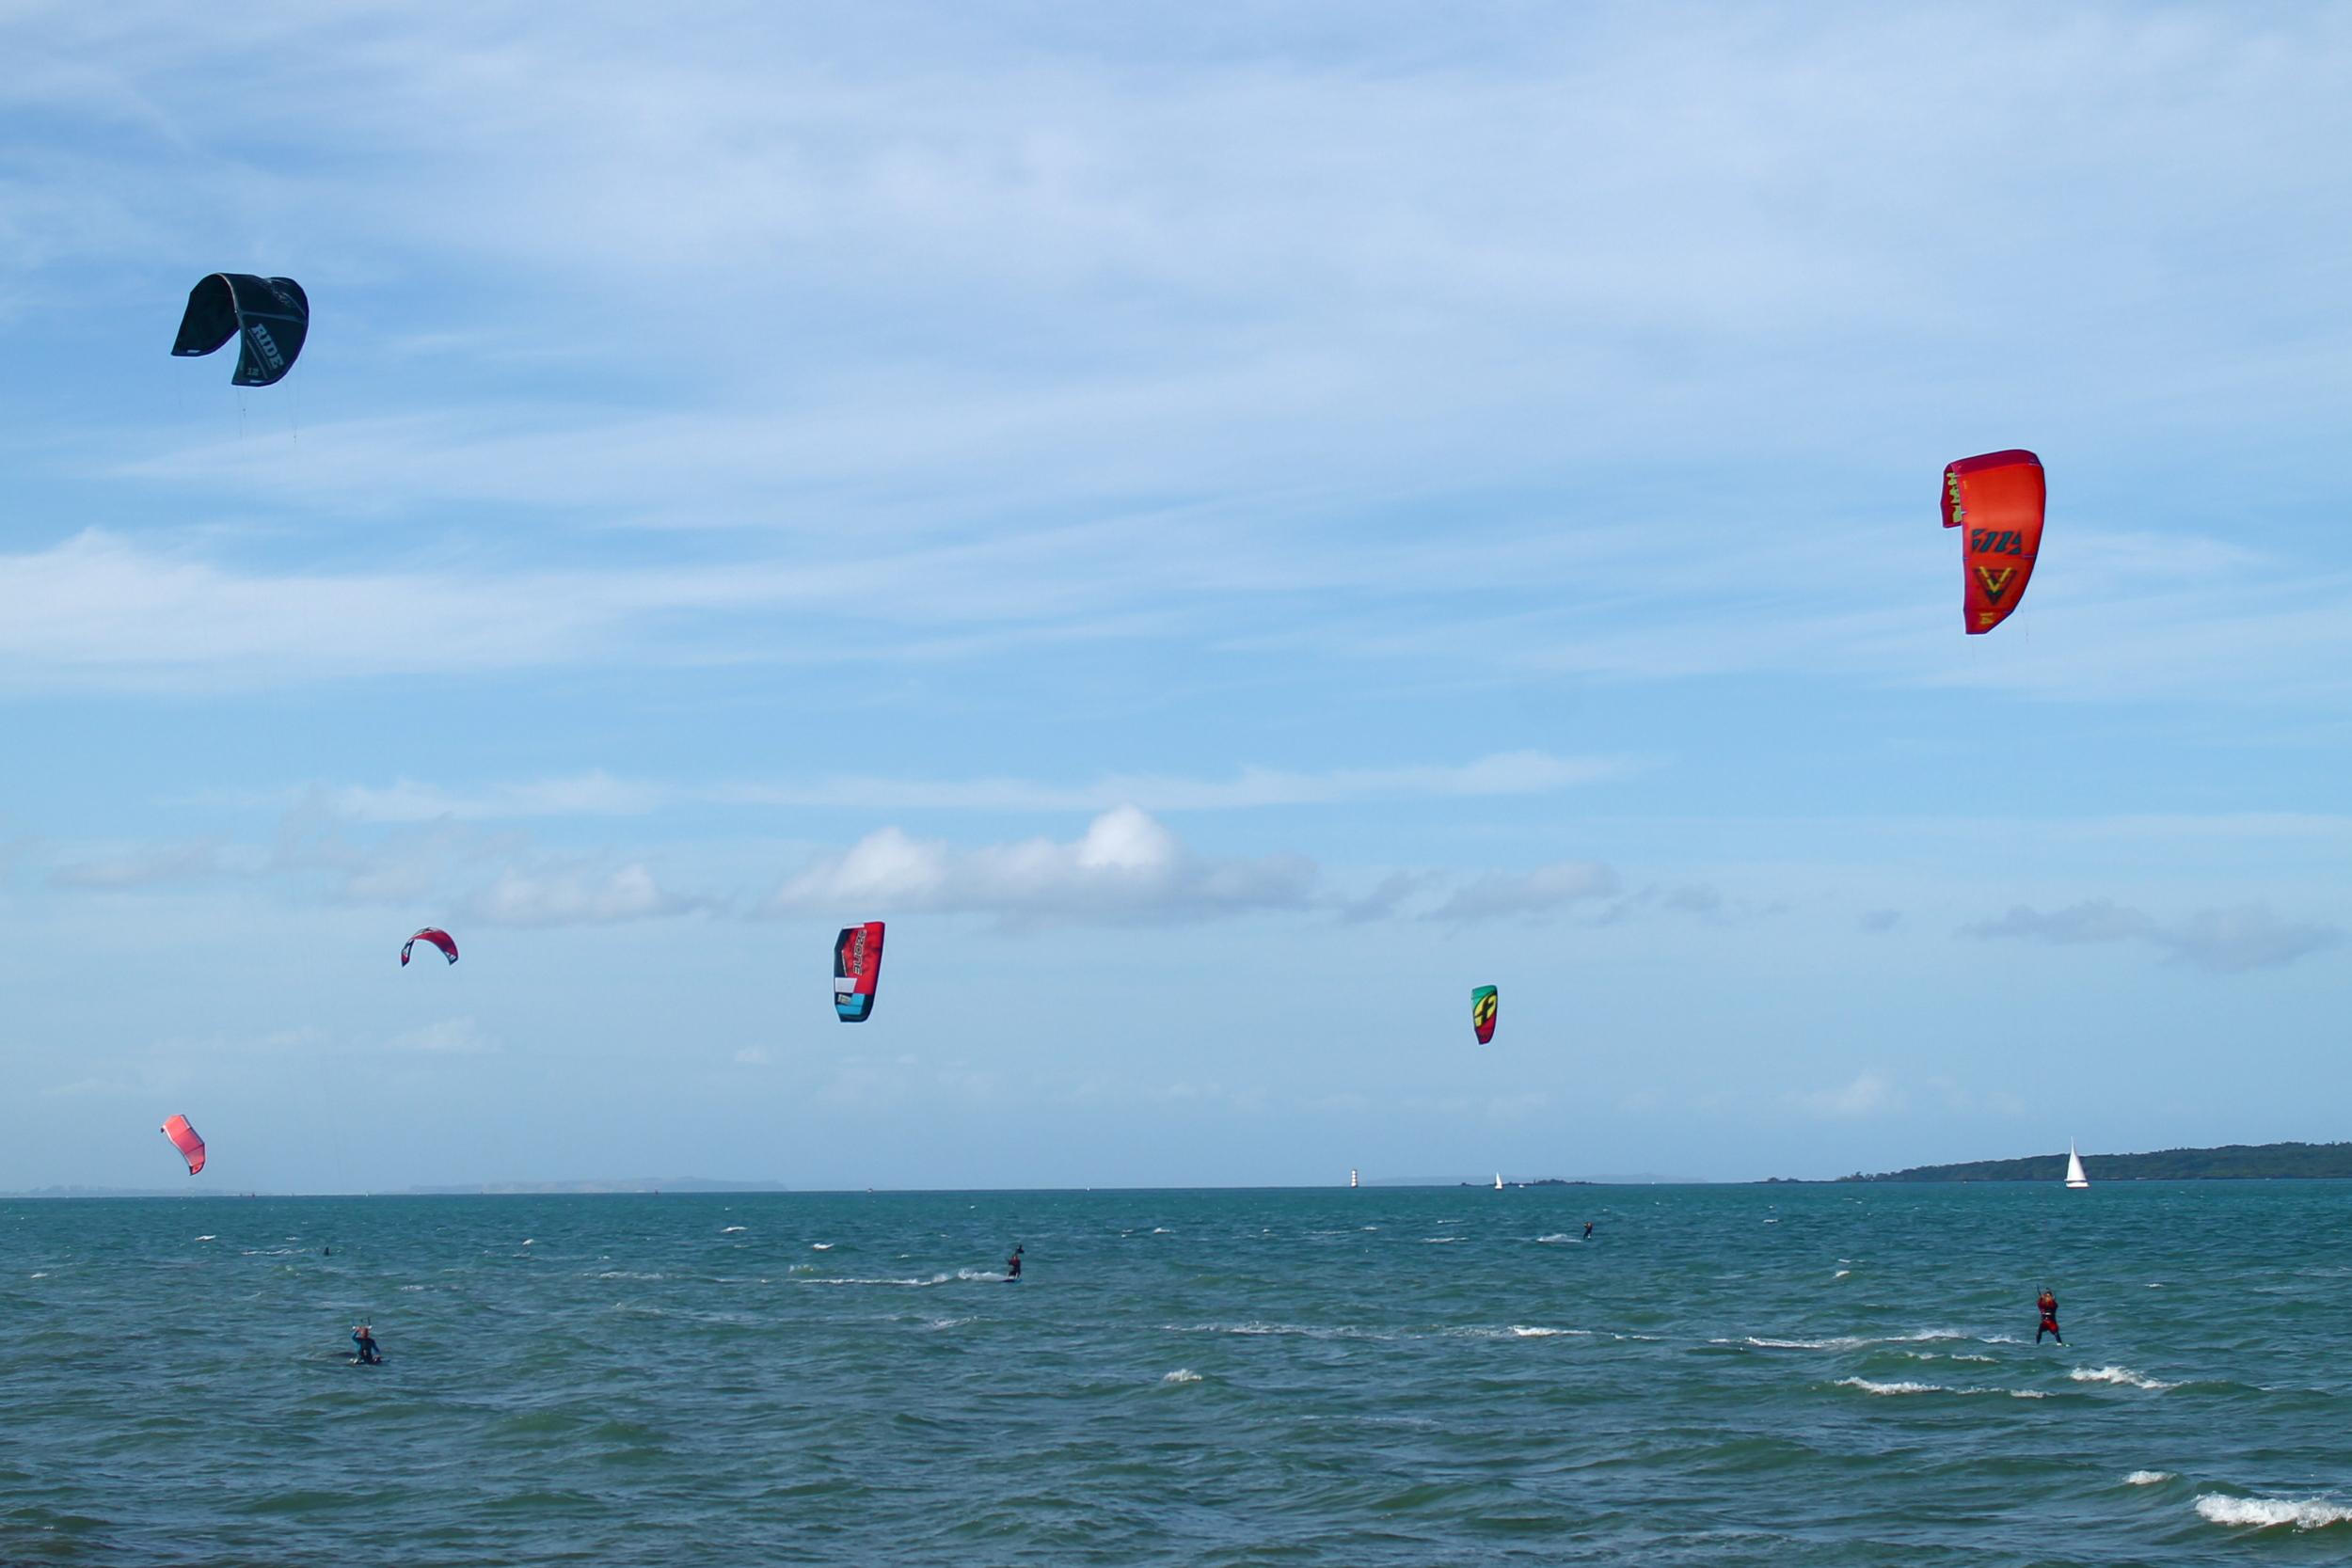 Kite surfers in Devonport.